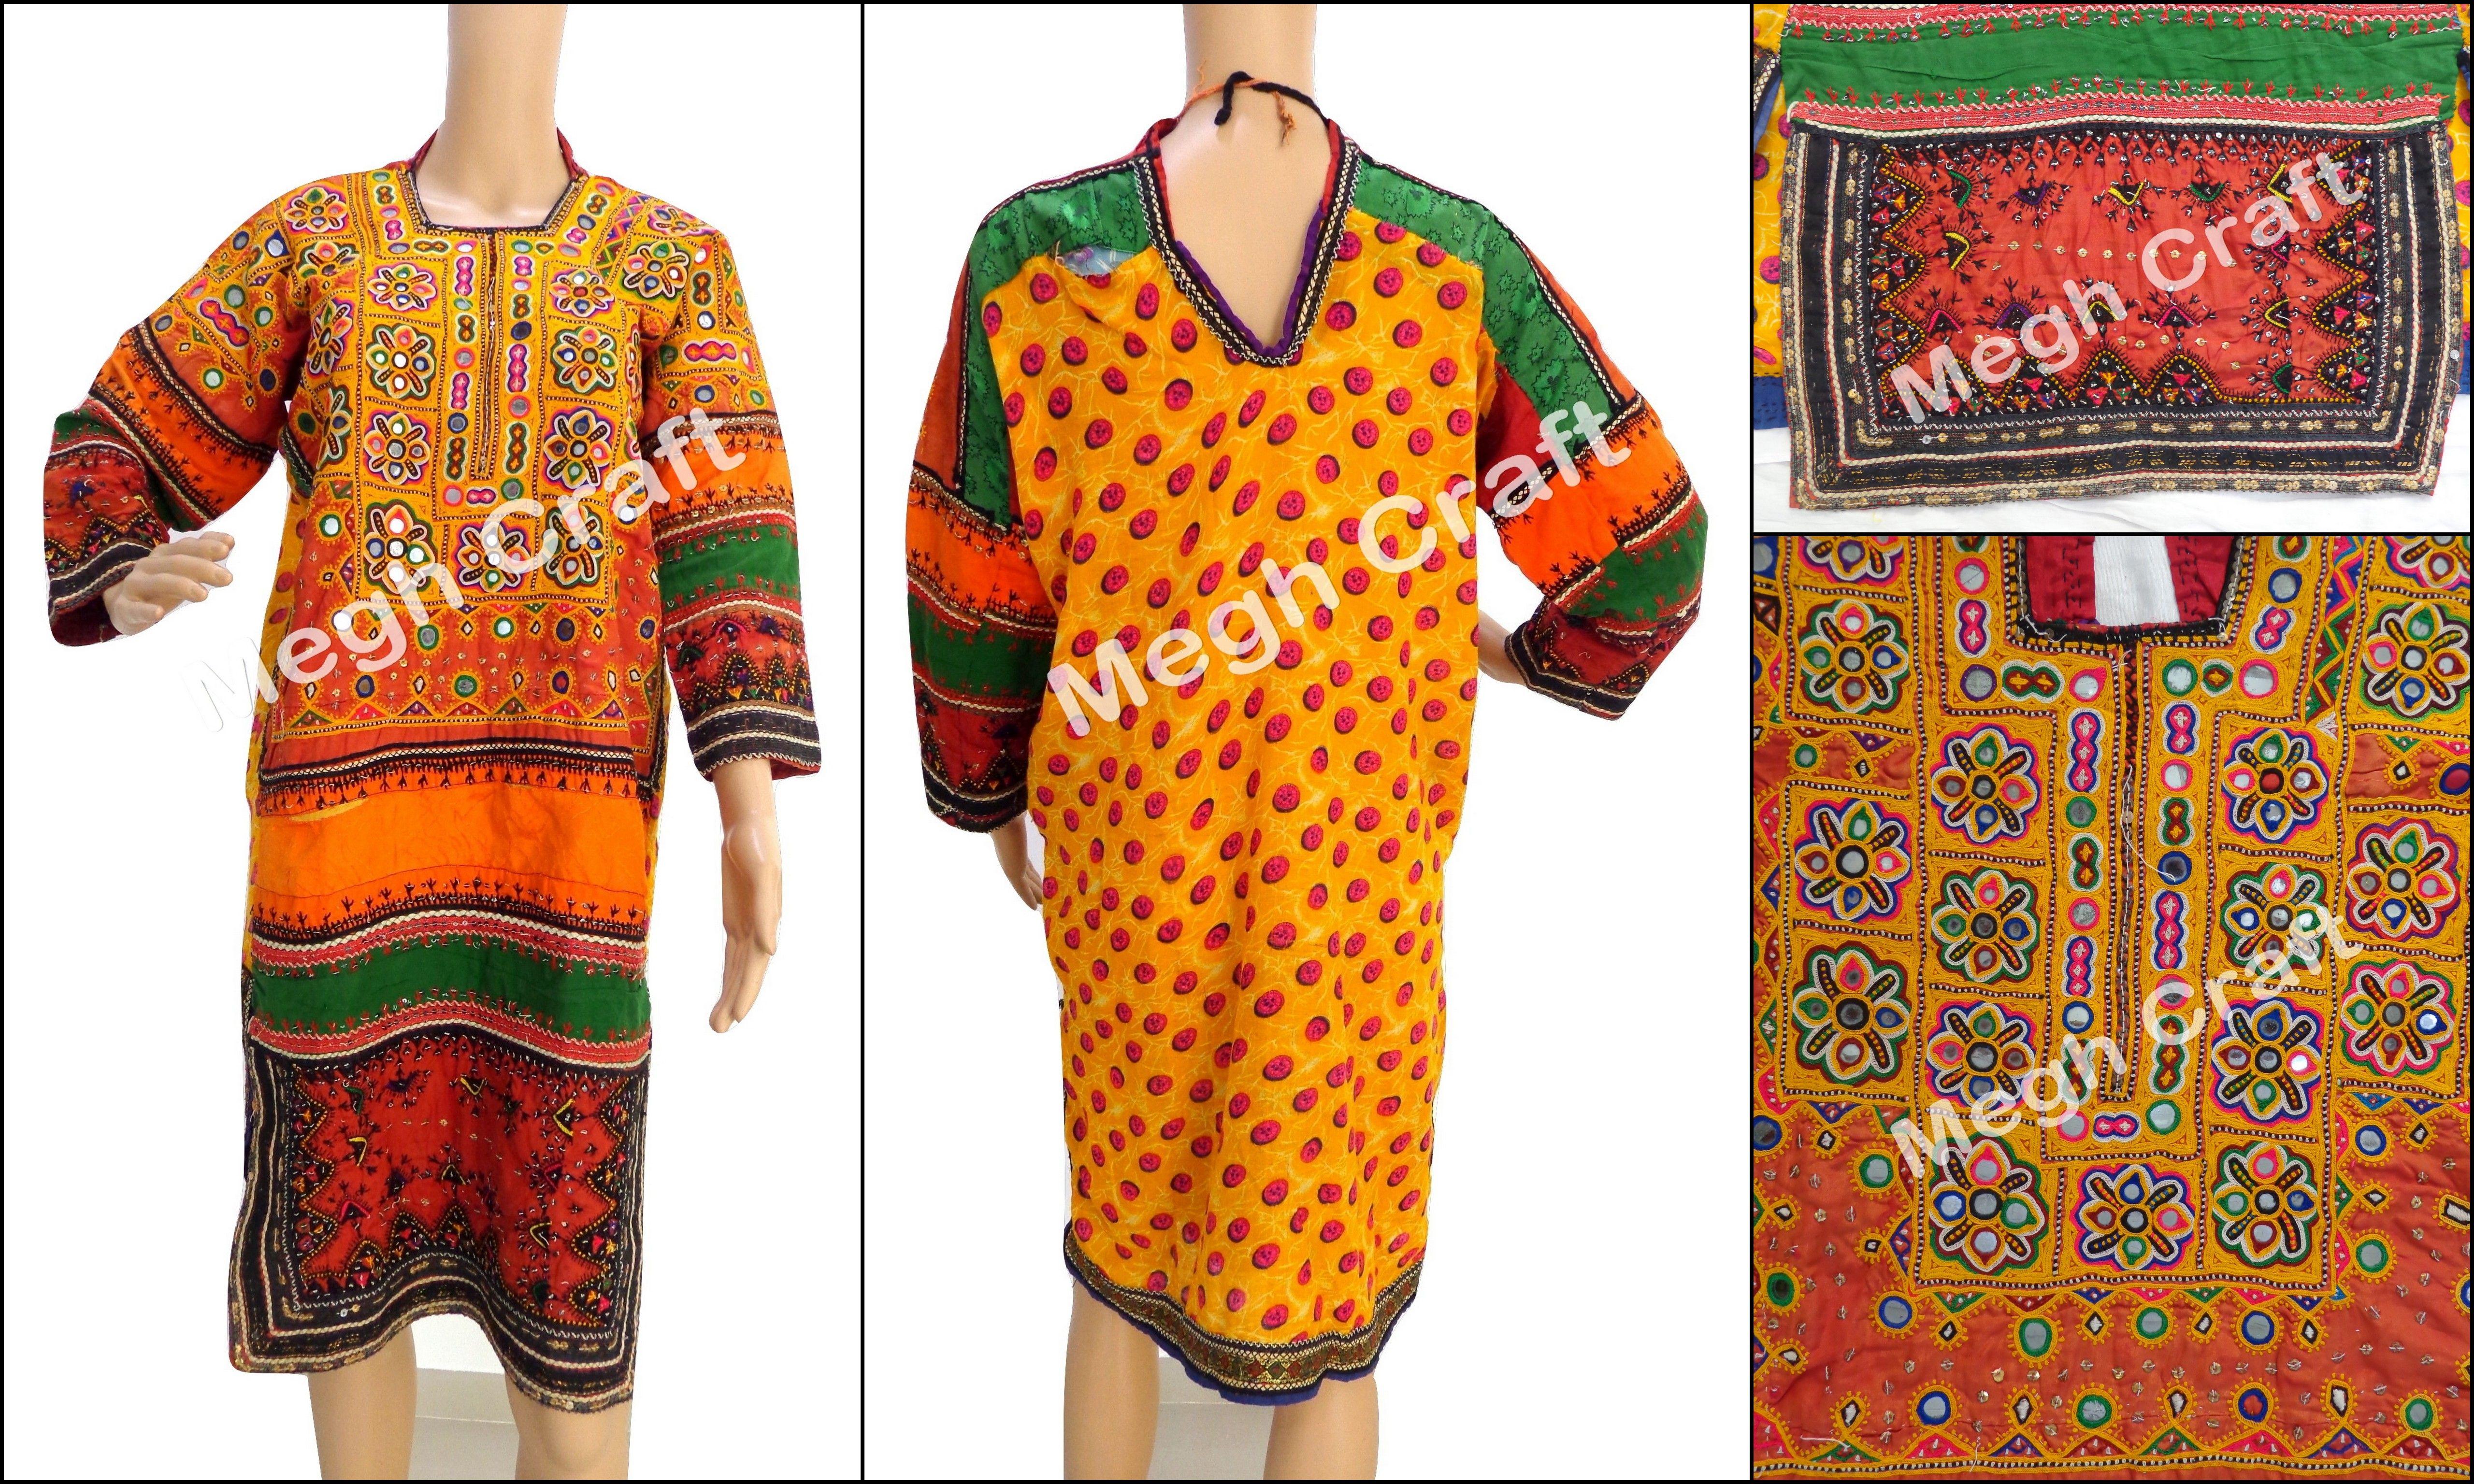 34a6f8f0946 Kuchi Dress-Afghan tunic -Banjara tunic-Afghan Dress Tribal Top-Boho-Hippy- Vintage-Handmade-Tunic Top traditional Afghan tunic / BY #CraftsOfGujarat  ...